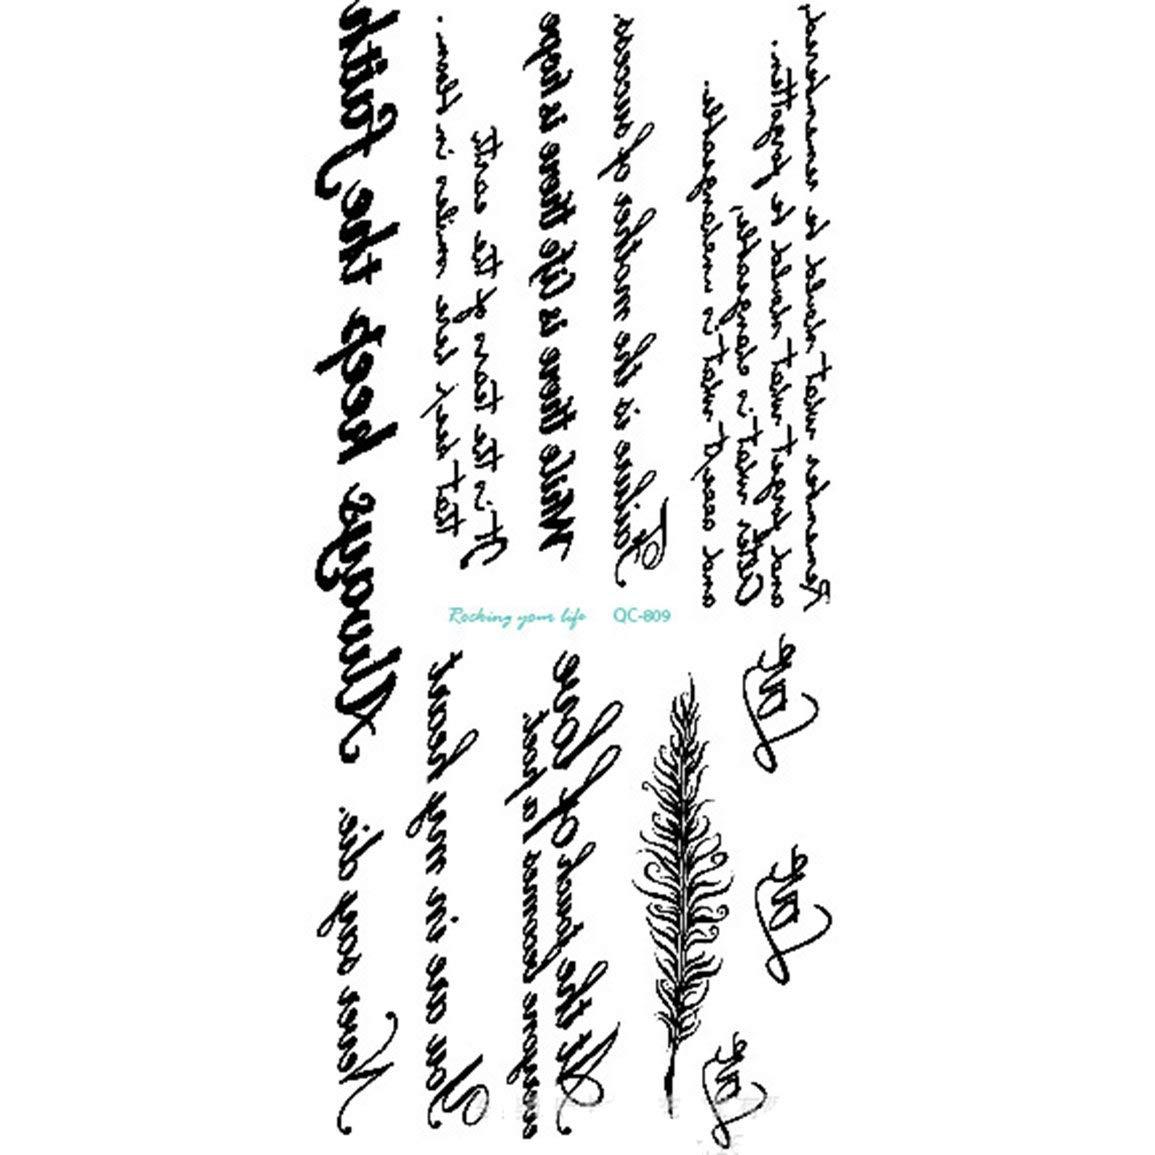 fghfhfgjdfj Letra Inglesa Impermeable Etiqueta engomada del Tatuaje Etiqueta engomada Impermeable del Tatuaje de la Personalidad 3D Personalidad Tatuaje Temporal de la Moda